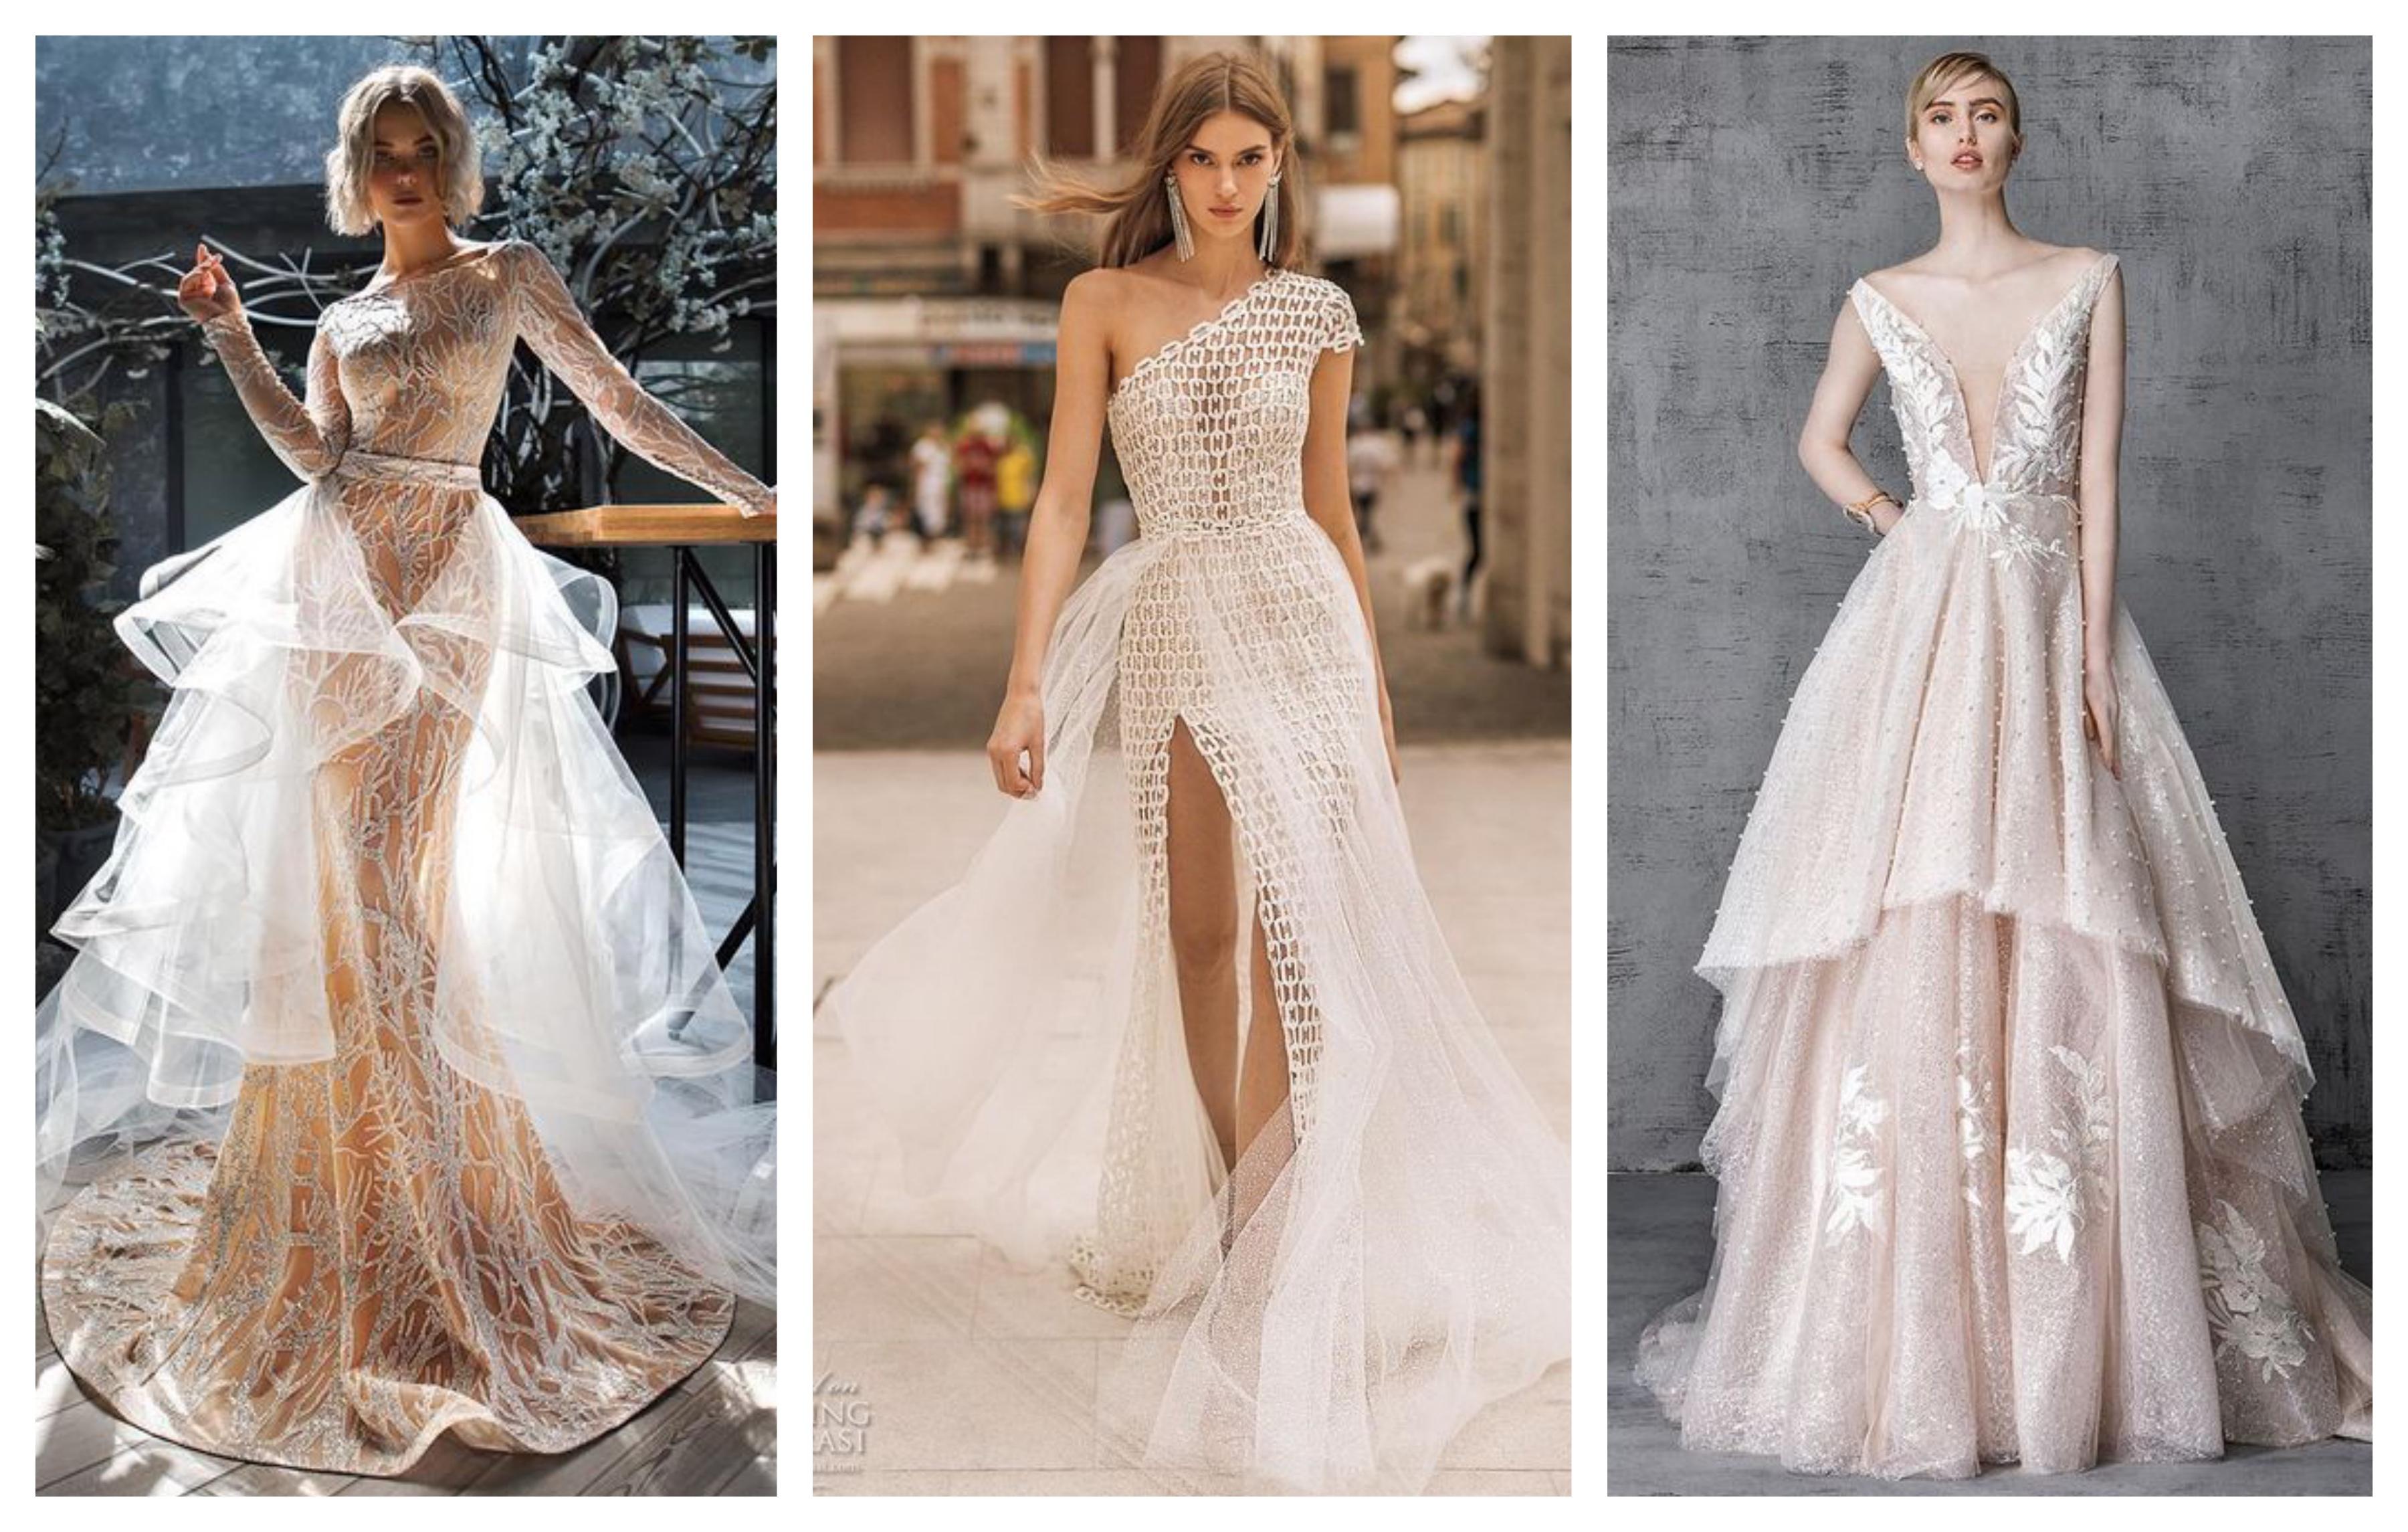 Платья со шлейфом 2019